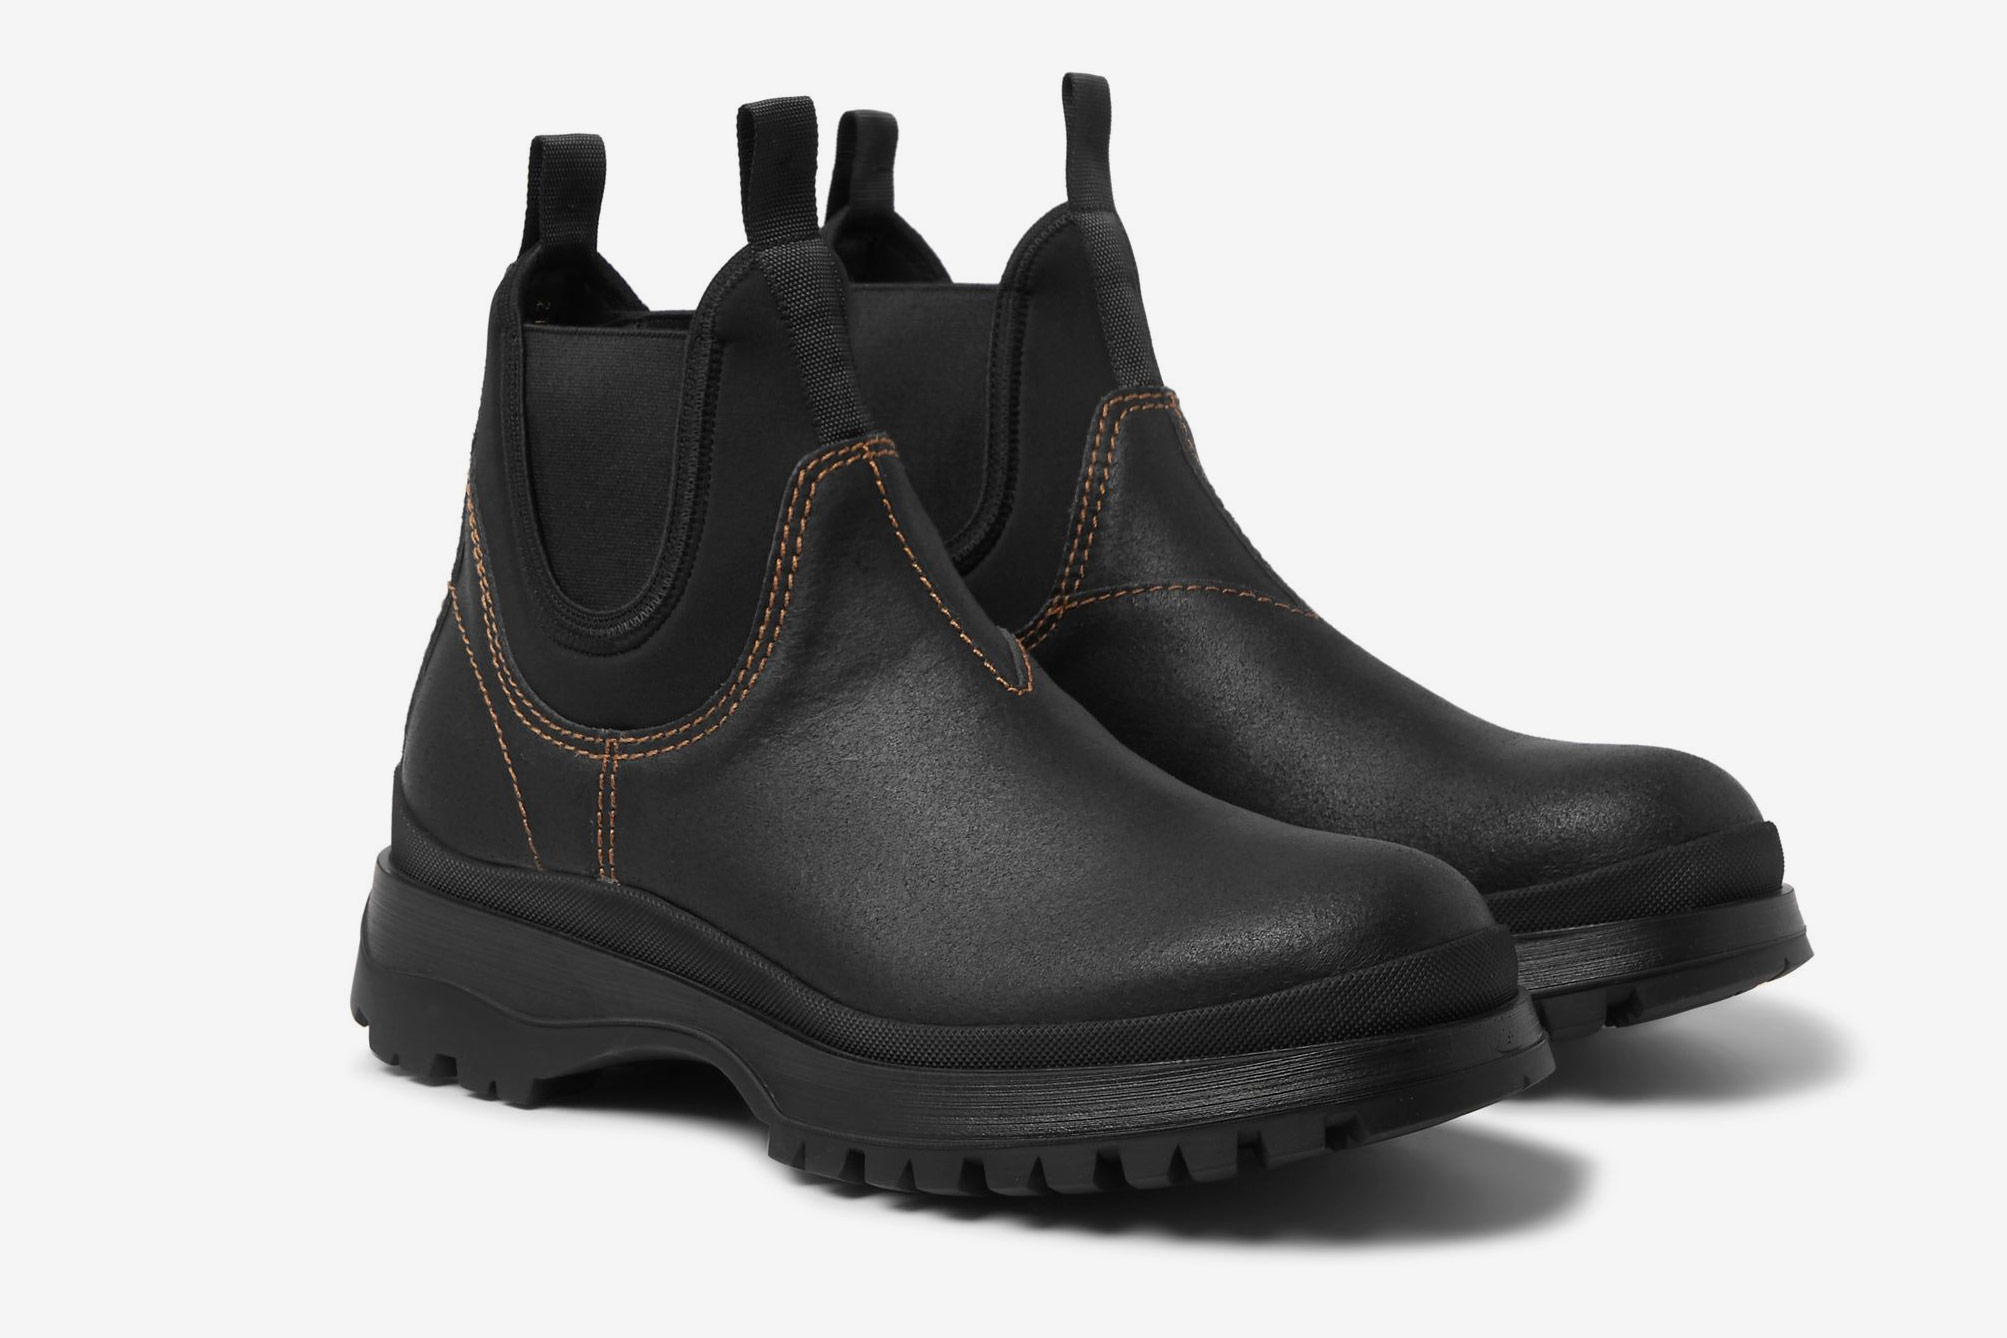 Prada Textured-Leather and Neoprene Chelsea Boots